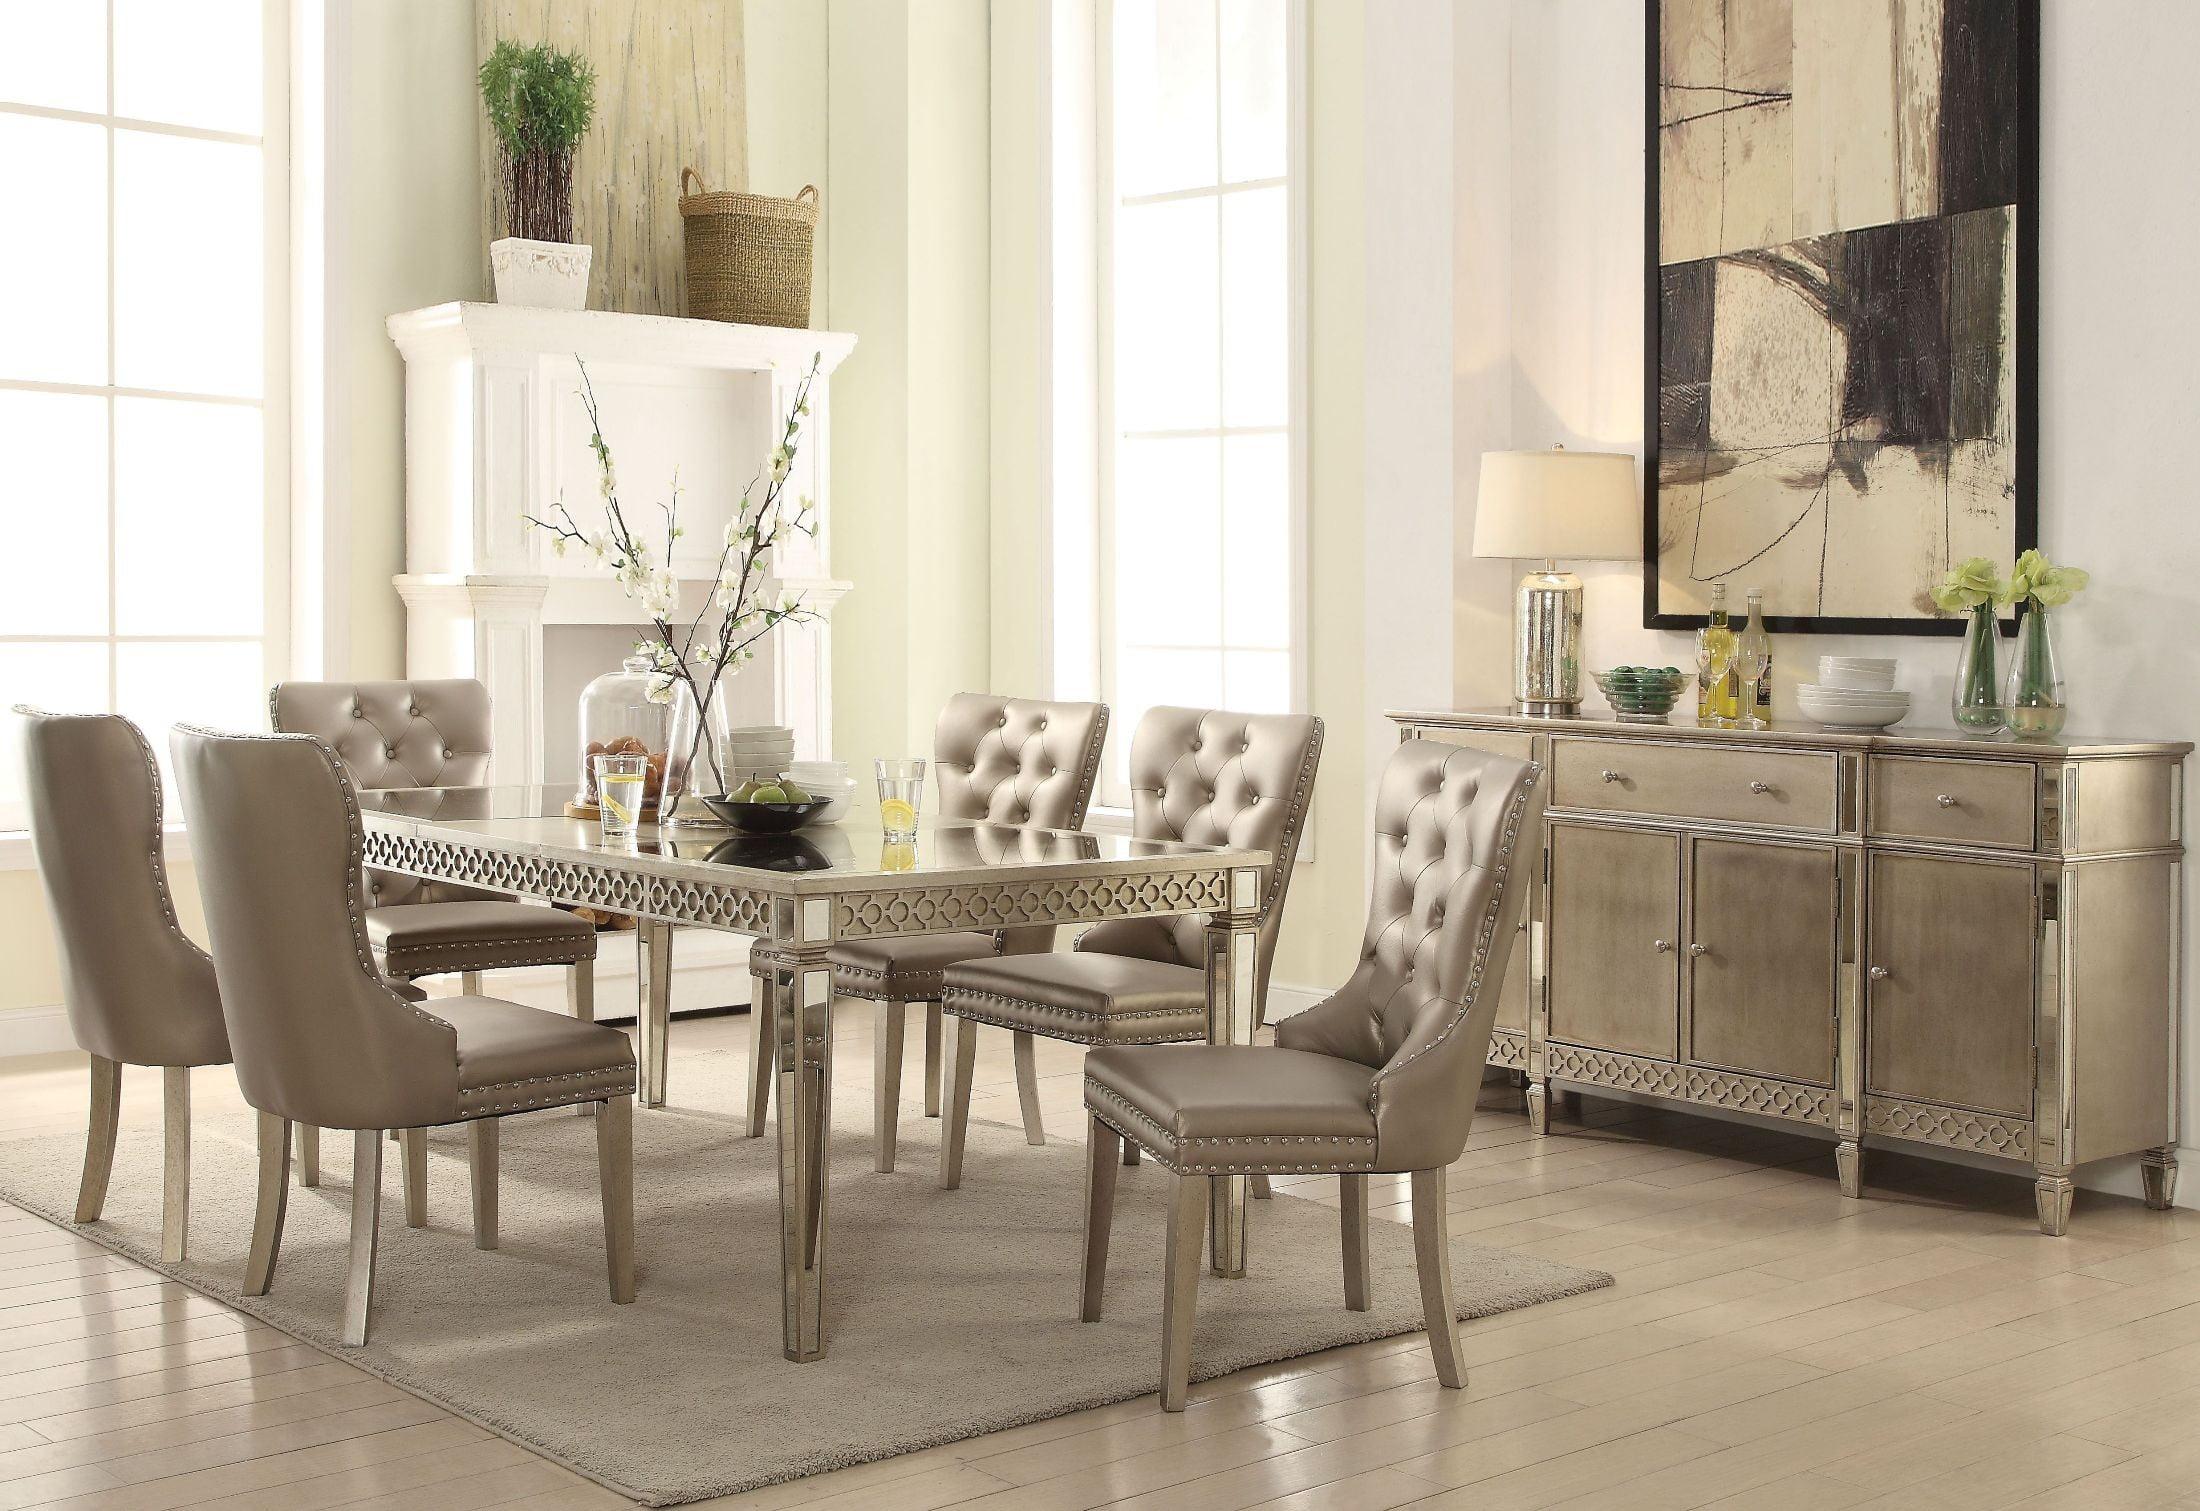 Kacela Champagne Dining Room Set from Acme | Coleman Furniture